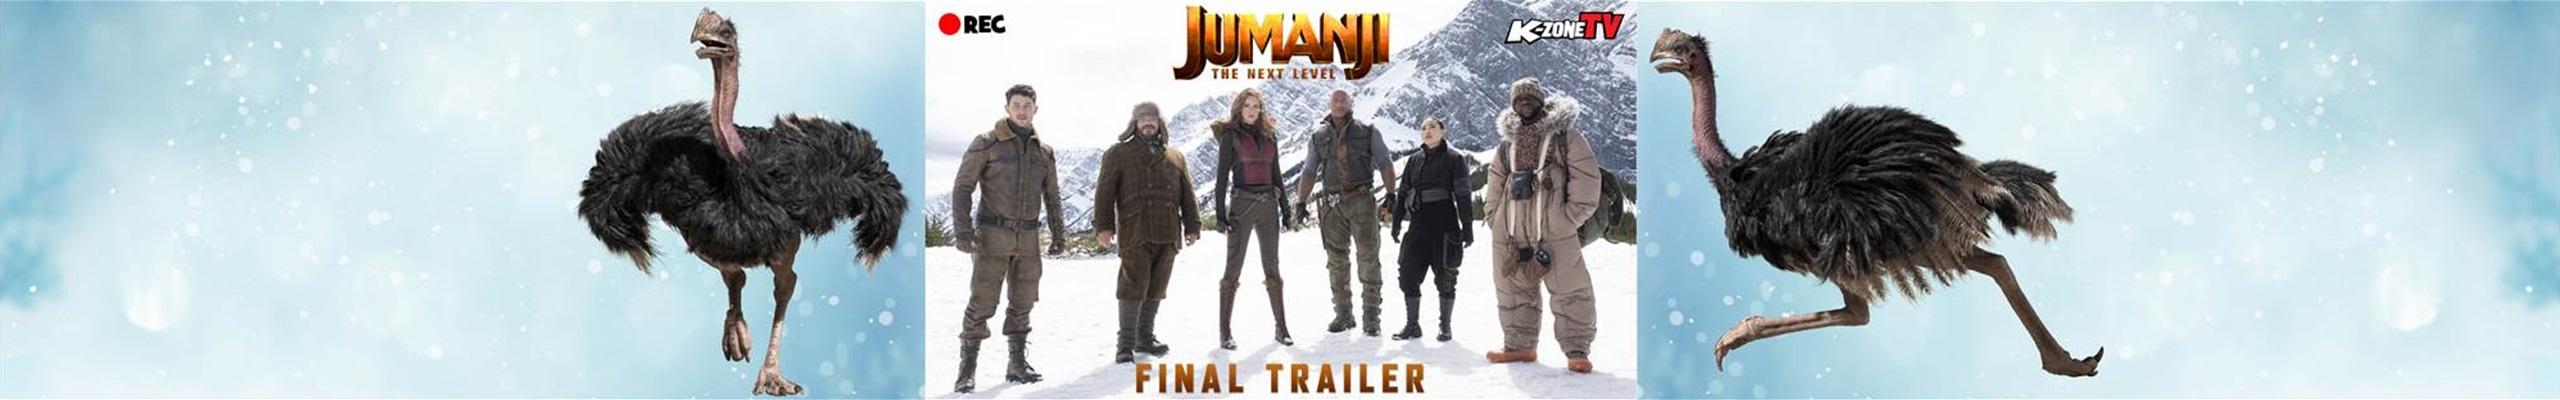 Jumanji: The Next Level Trailer